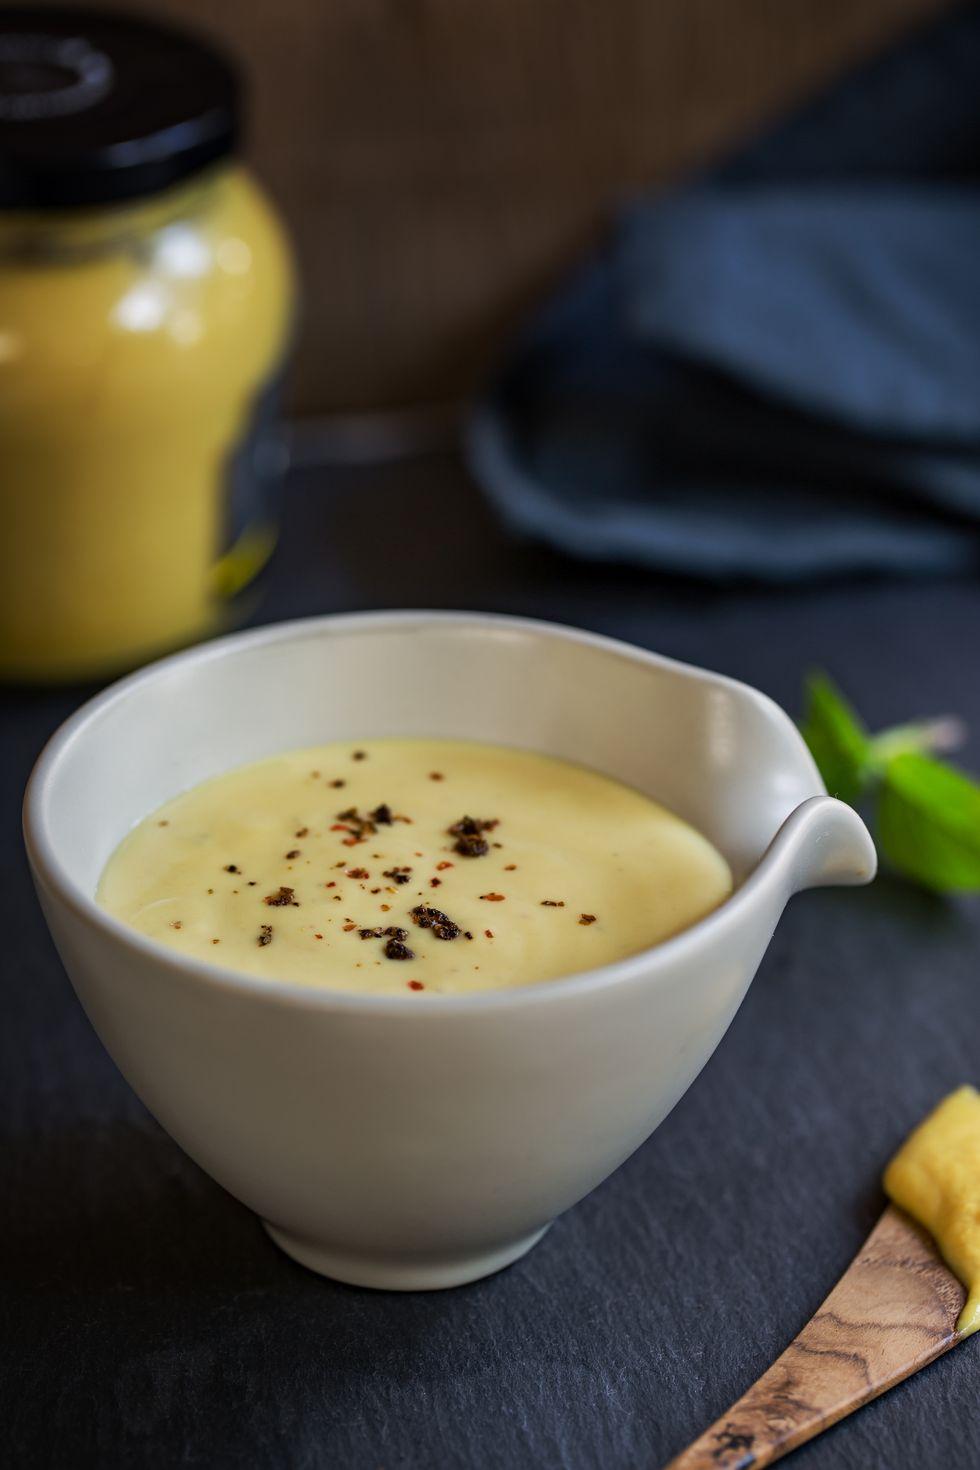 Geoffrey Zakarian's Spicy Yogurt and Lime Salad Dressing